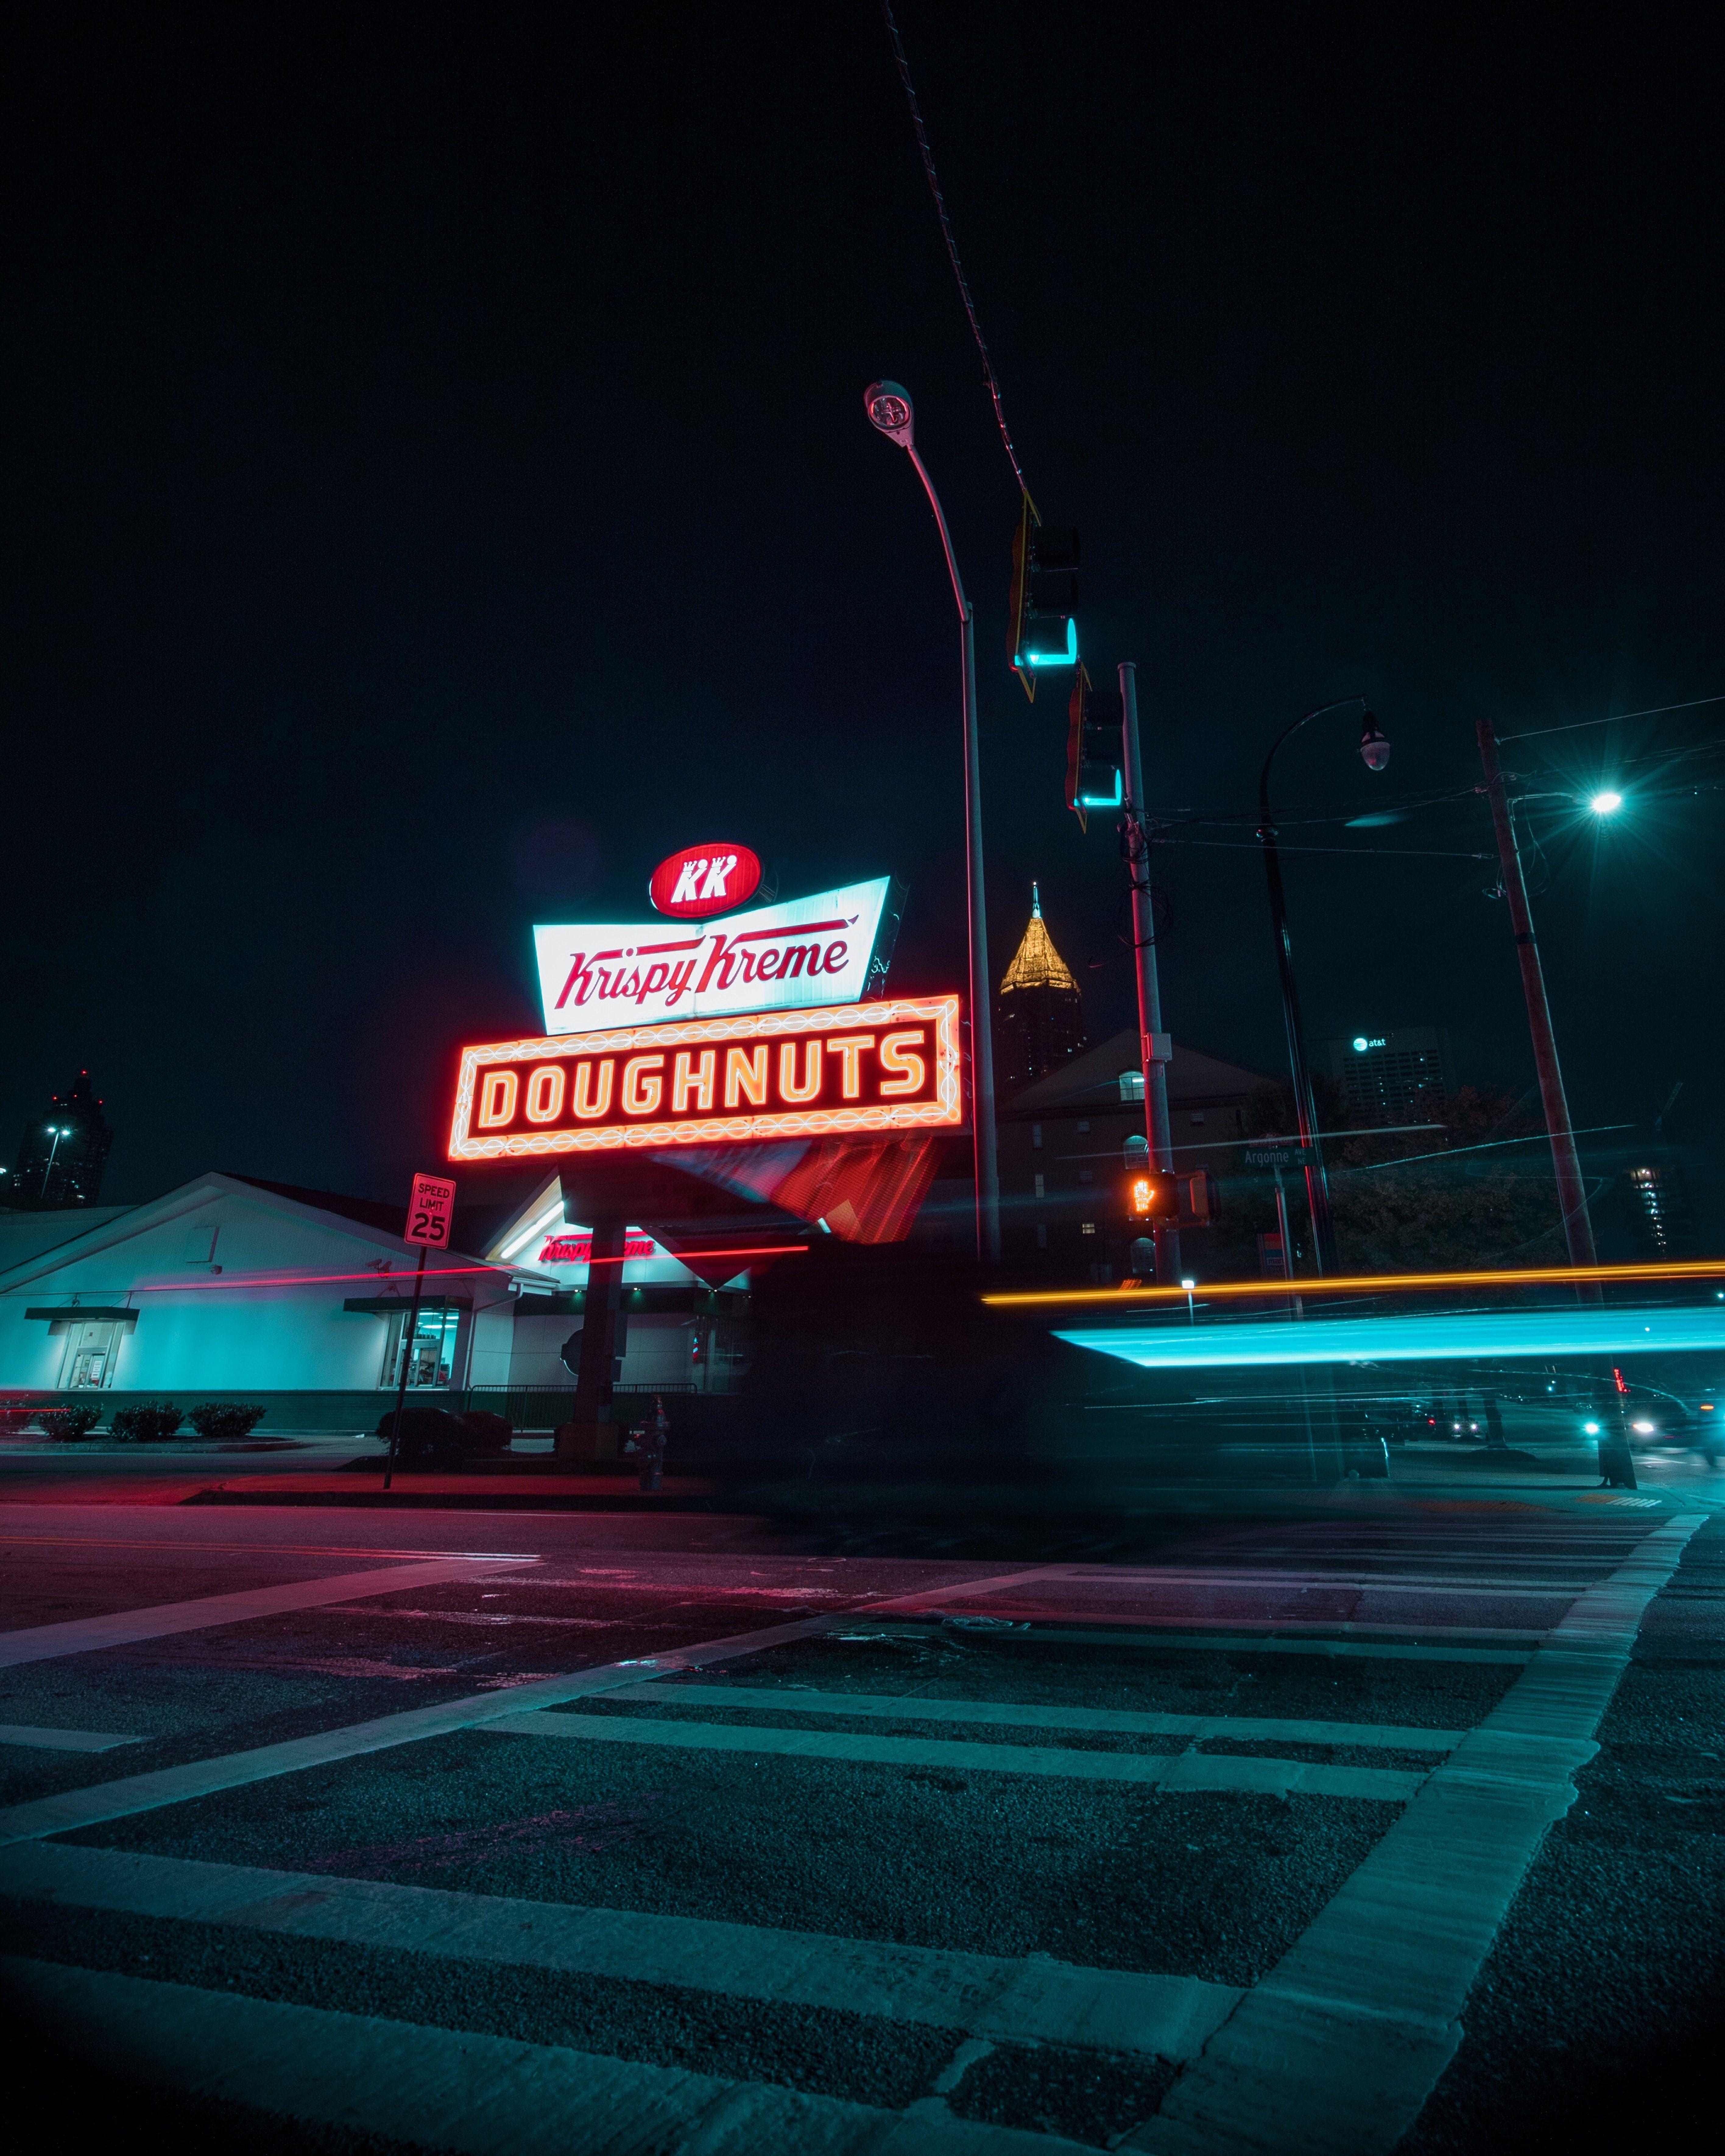 Munchies Photo By Cory Gazaille Corygazai On Unsplash Lightroom Presets Lightroom American Photography